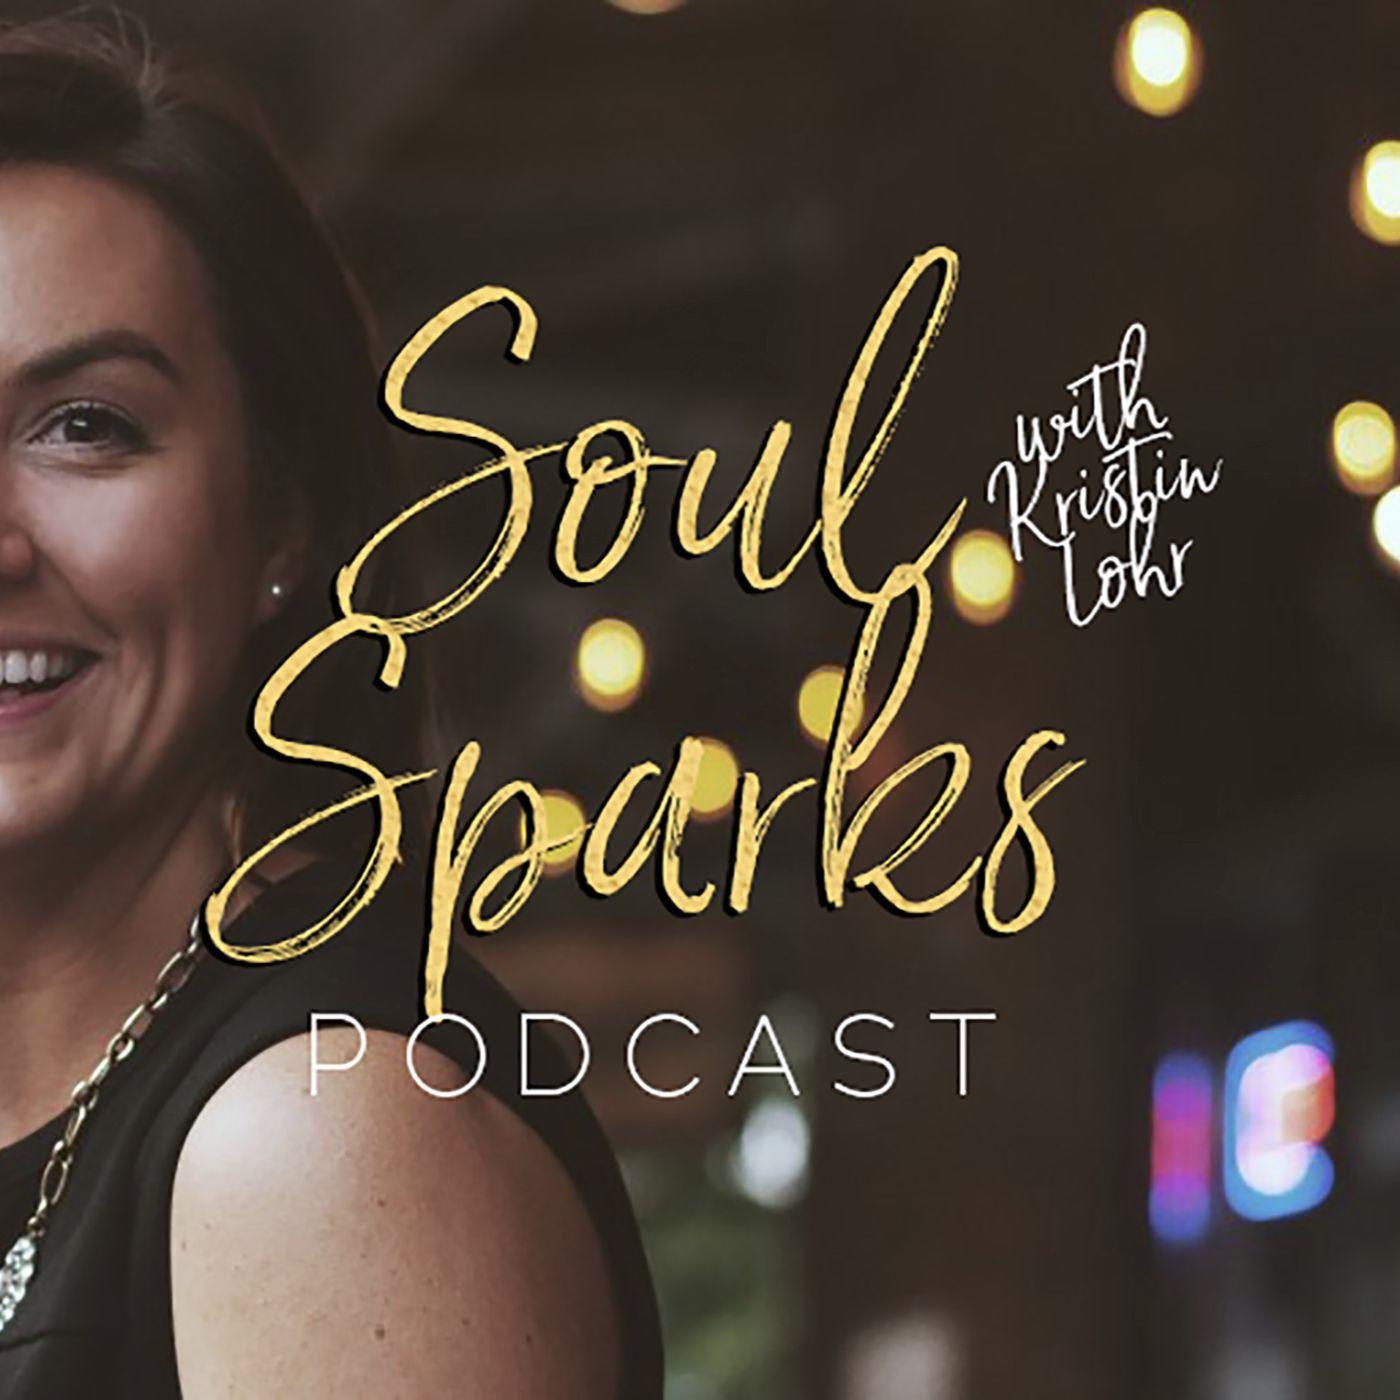 Soul Sparks Podcast on Apple Podcasts